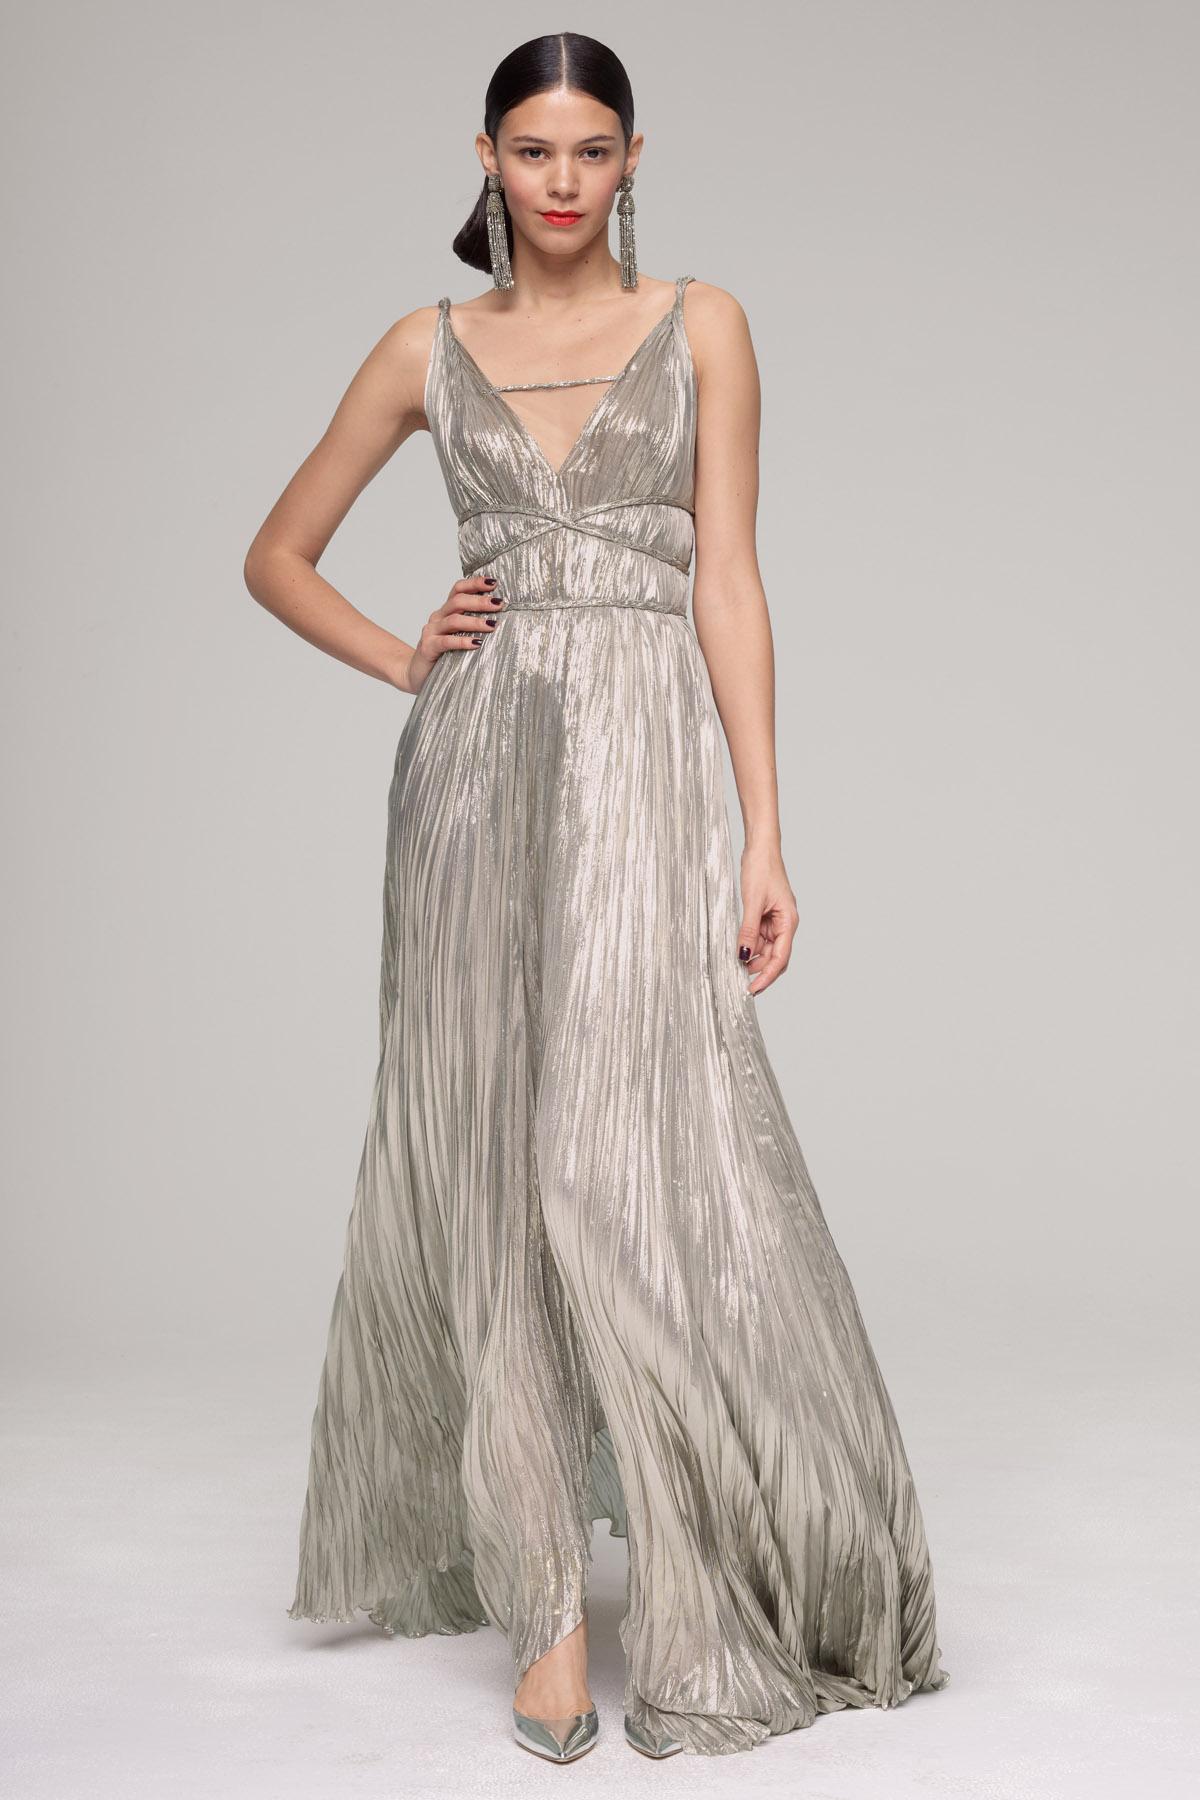 Lyst - Oscar De La Renta Grecian Column Gown in Gray